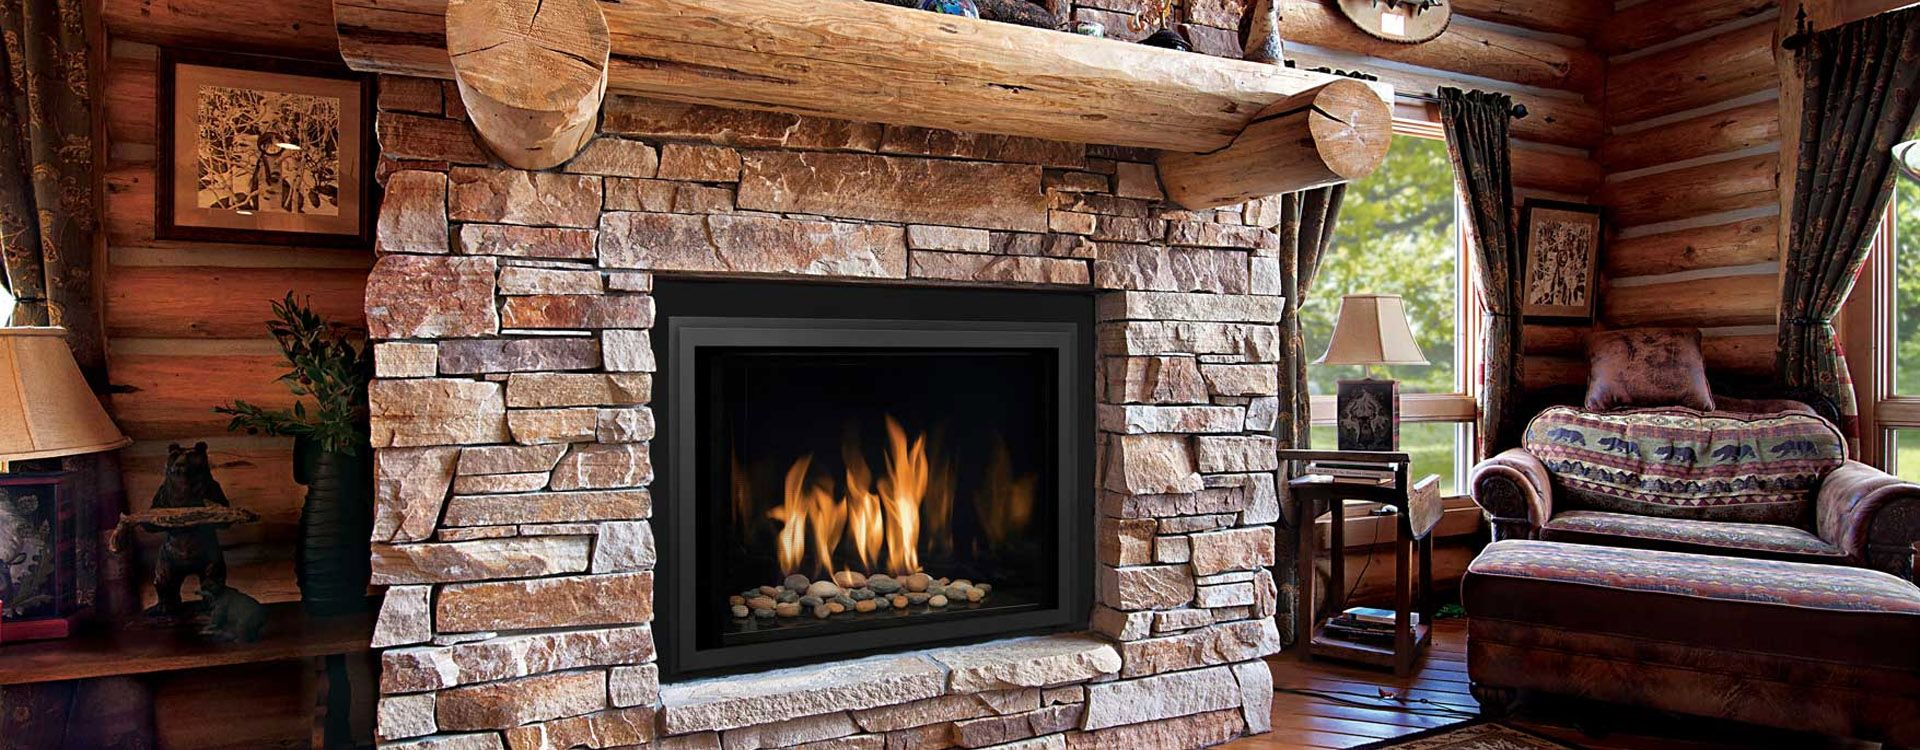 Twin City Fireplace Amp Stone Co Fireplaces Minneapolis Rustic Fireplaces Rustic Fireplace Mantels Fireplace